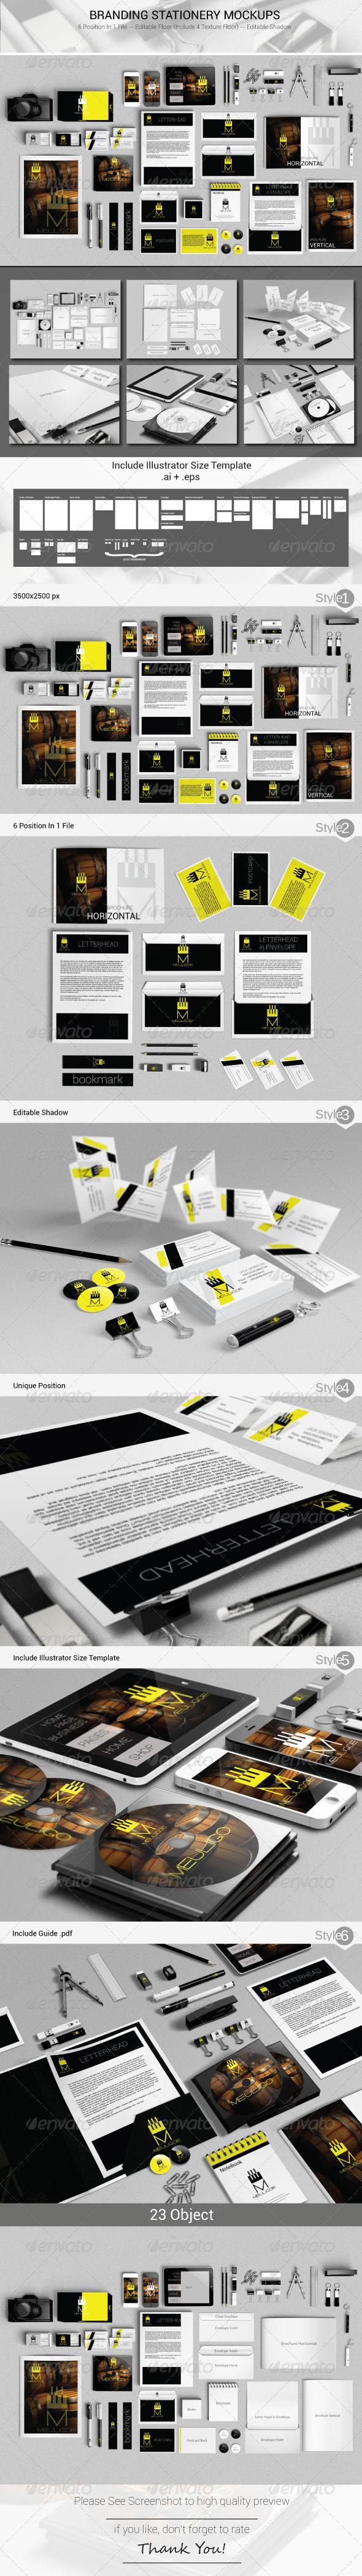 GraphicRiver Branding Stationery Mockups 5127280